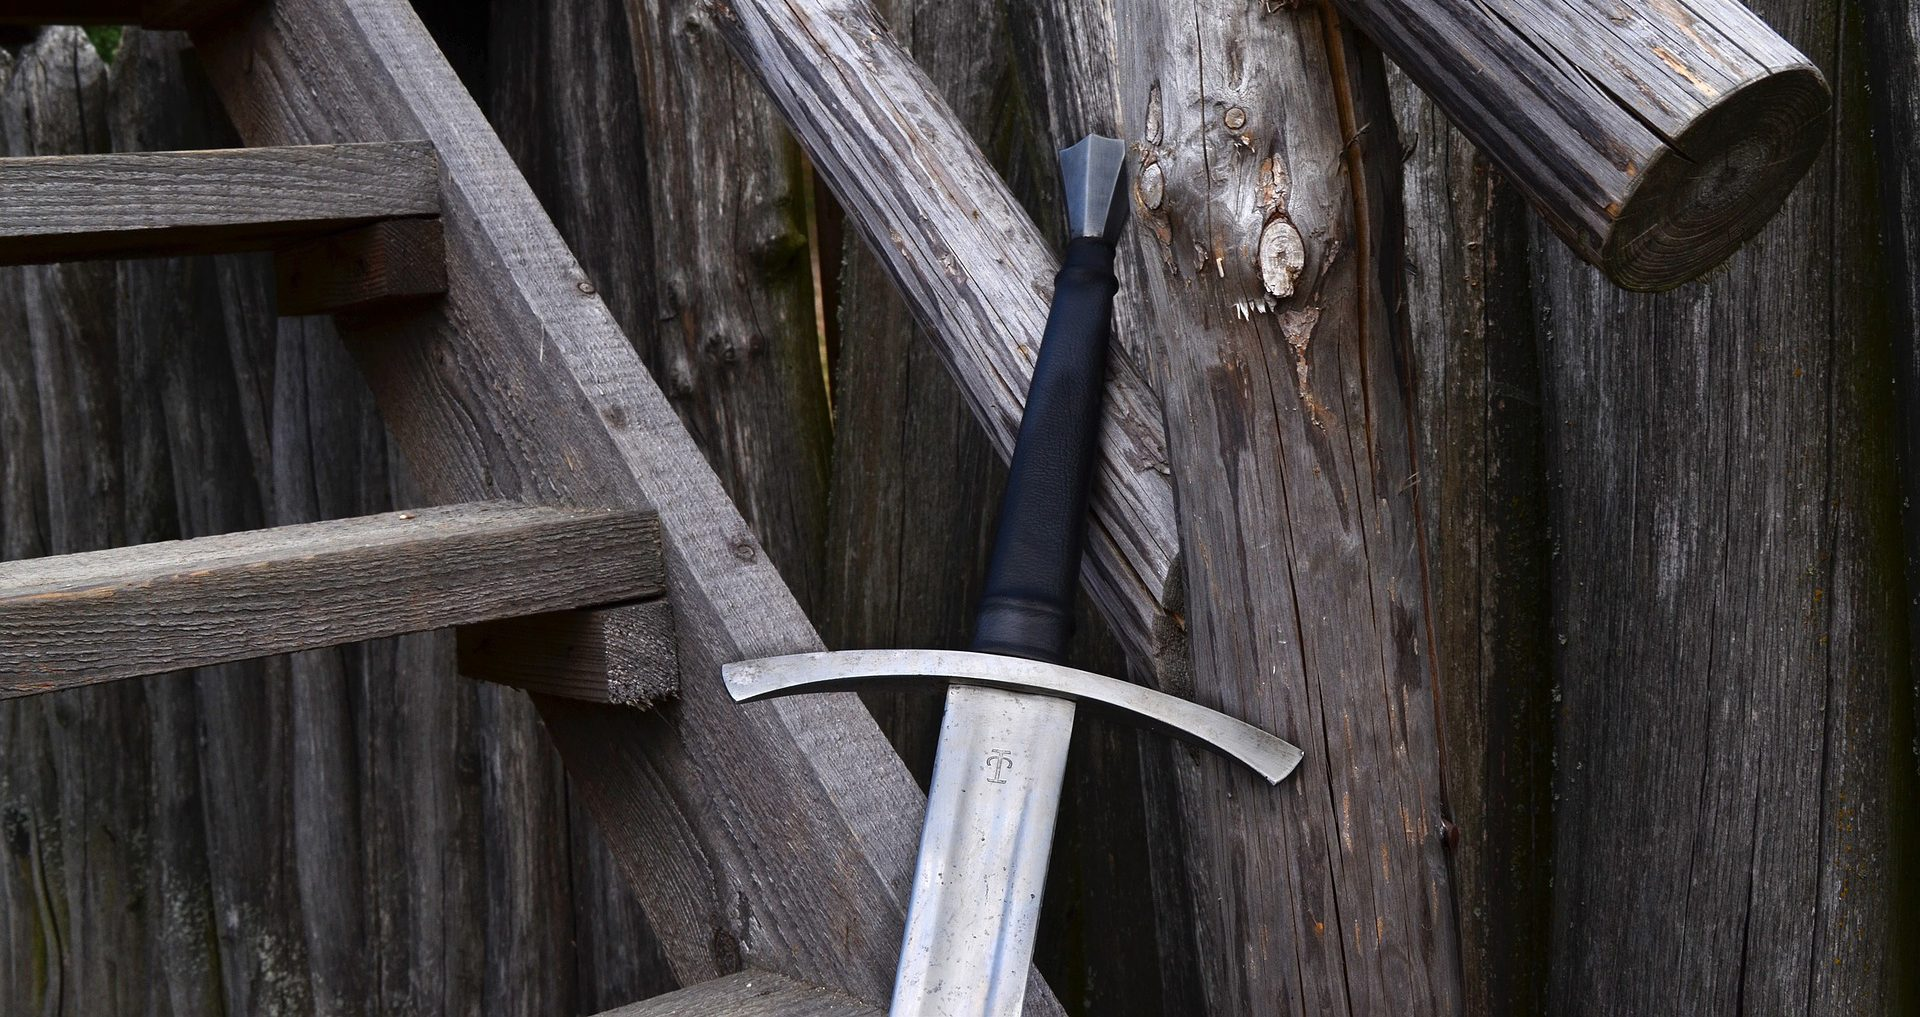 Medieval Weapons - sword